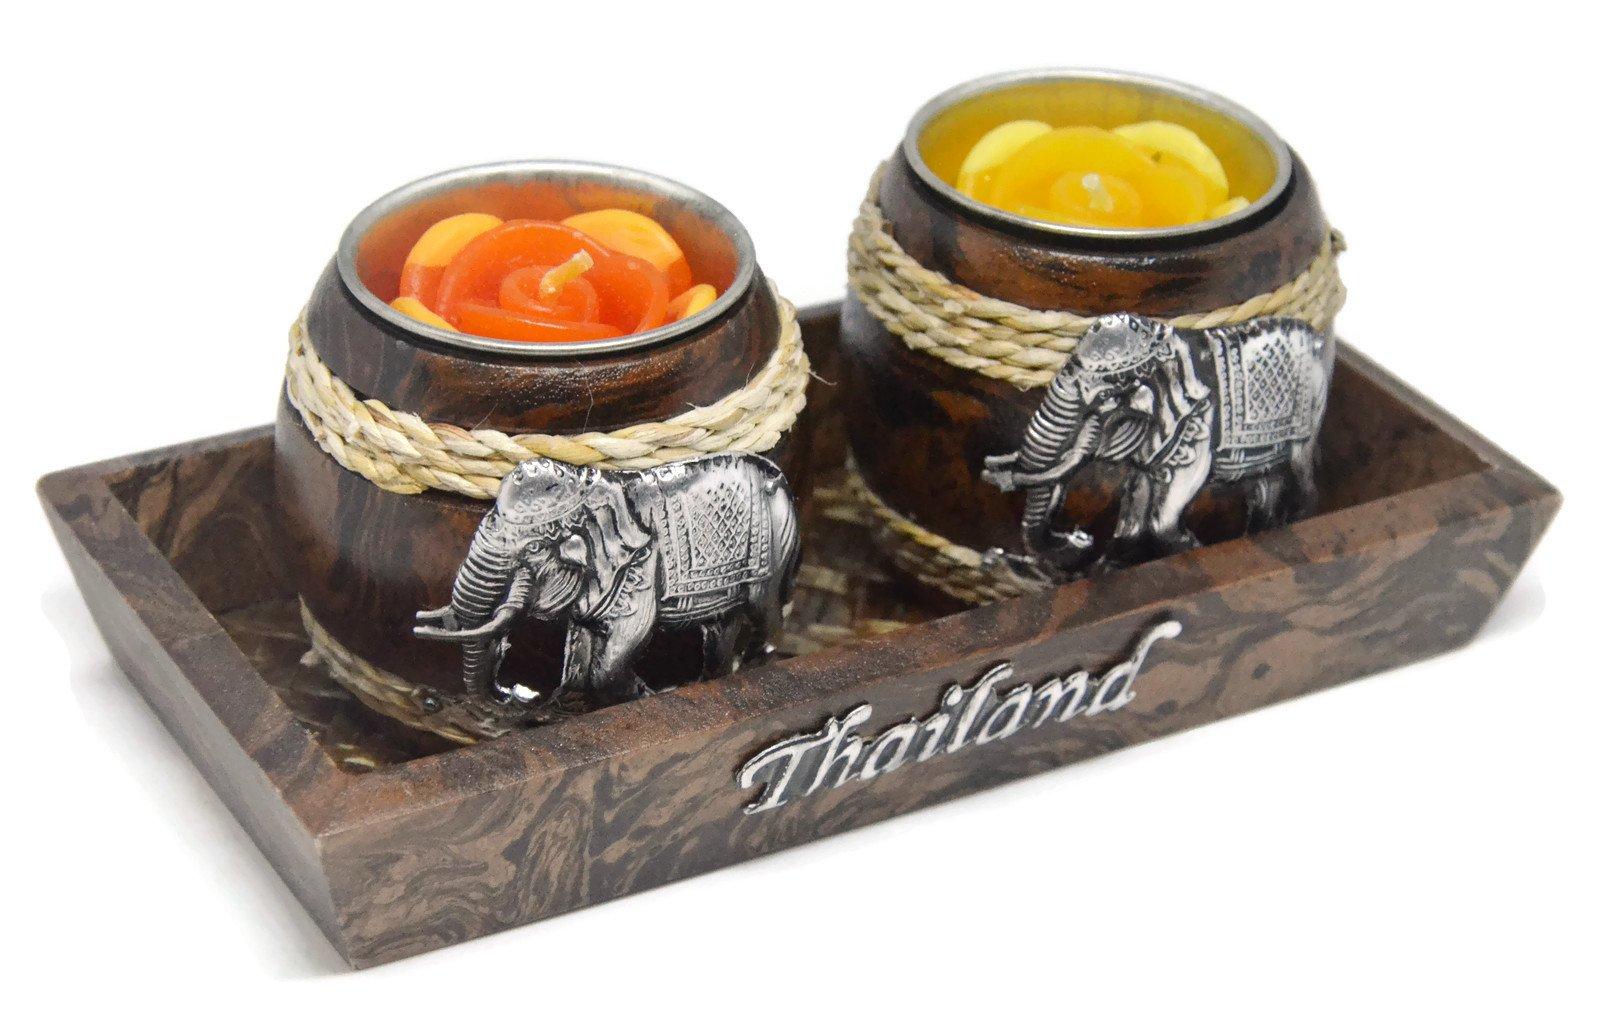 NaCraftTH Candle Holder Set Wood Thai Elephants Metal Carved Handicraft Artwork Dining Room Spa Restaurant Decor Antique Style (3)